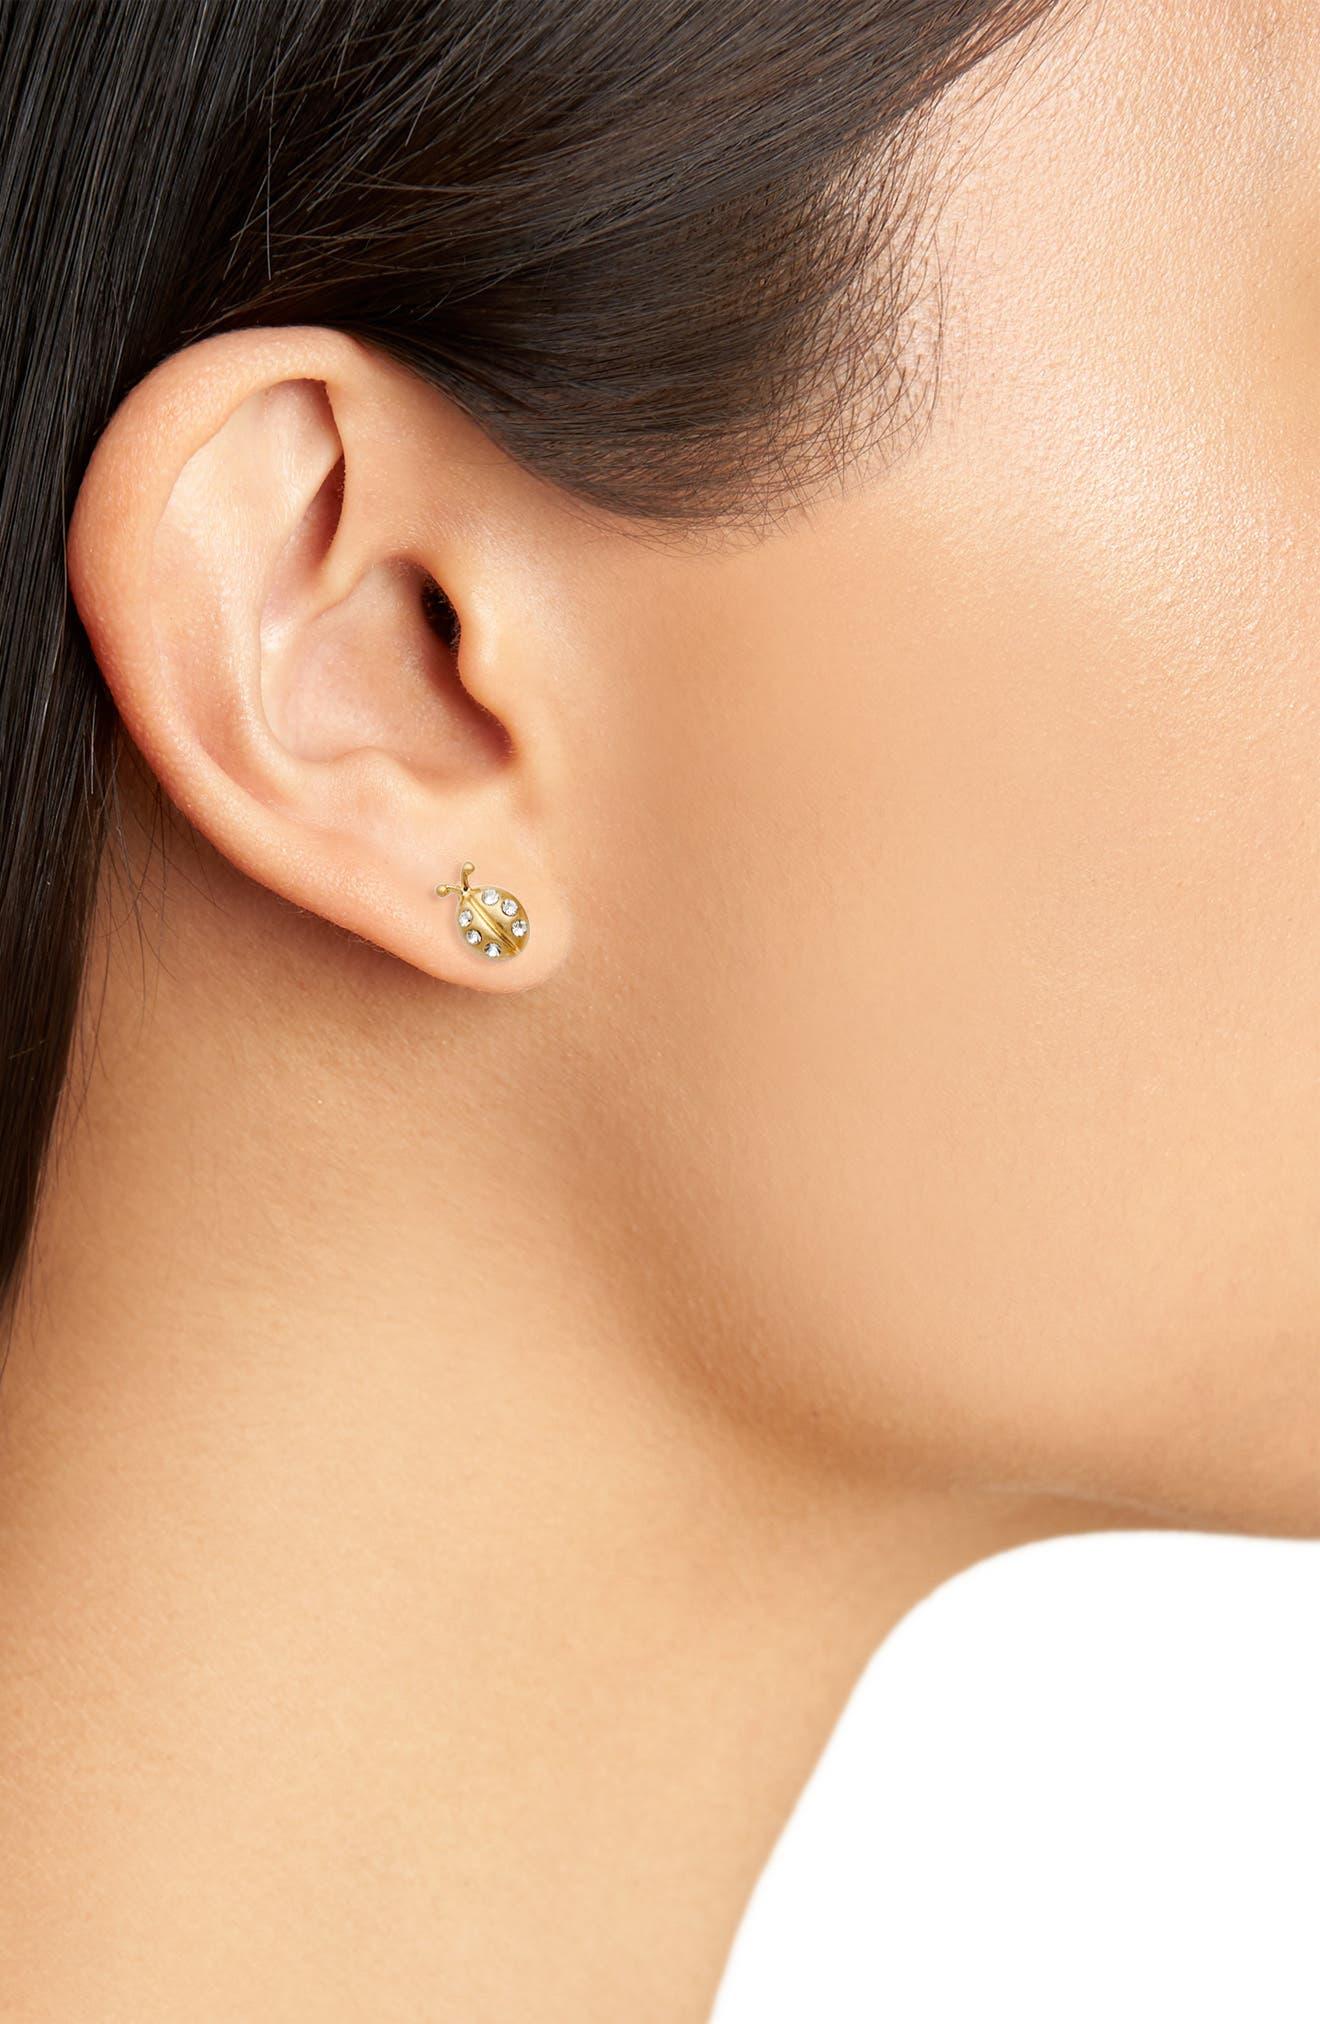 Set of 2 Jeweled Ladybug Earrings,                             Alternate thumbnail 2, color,                             White Opal- Gold